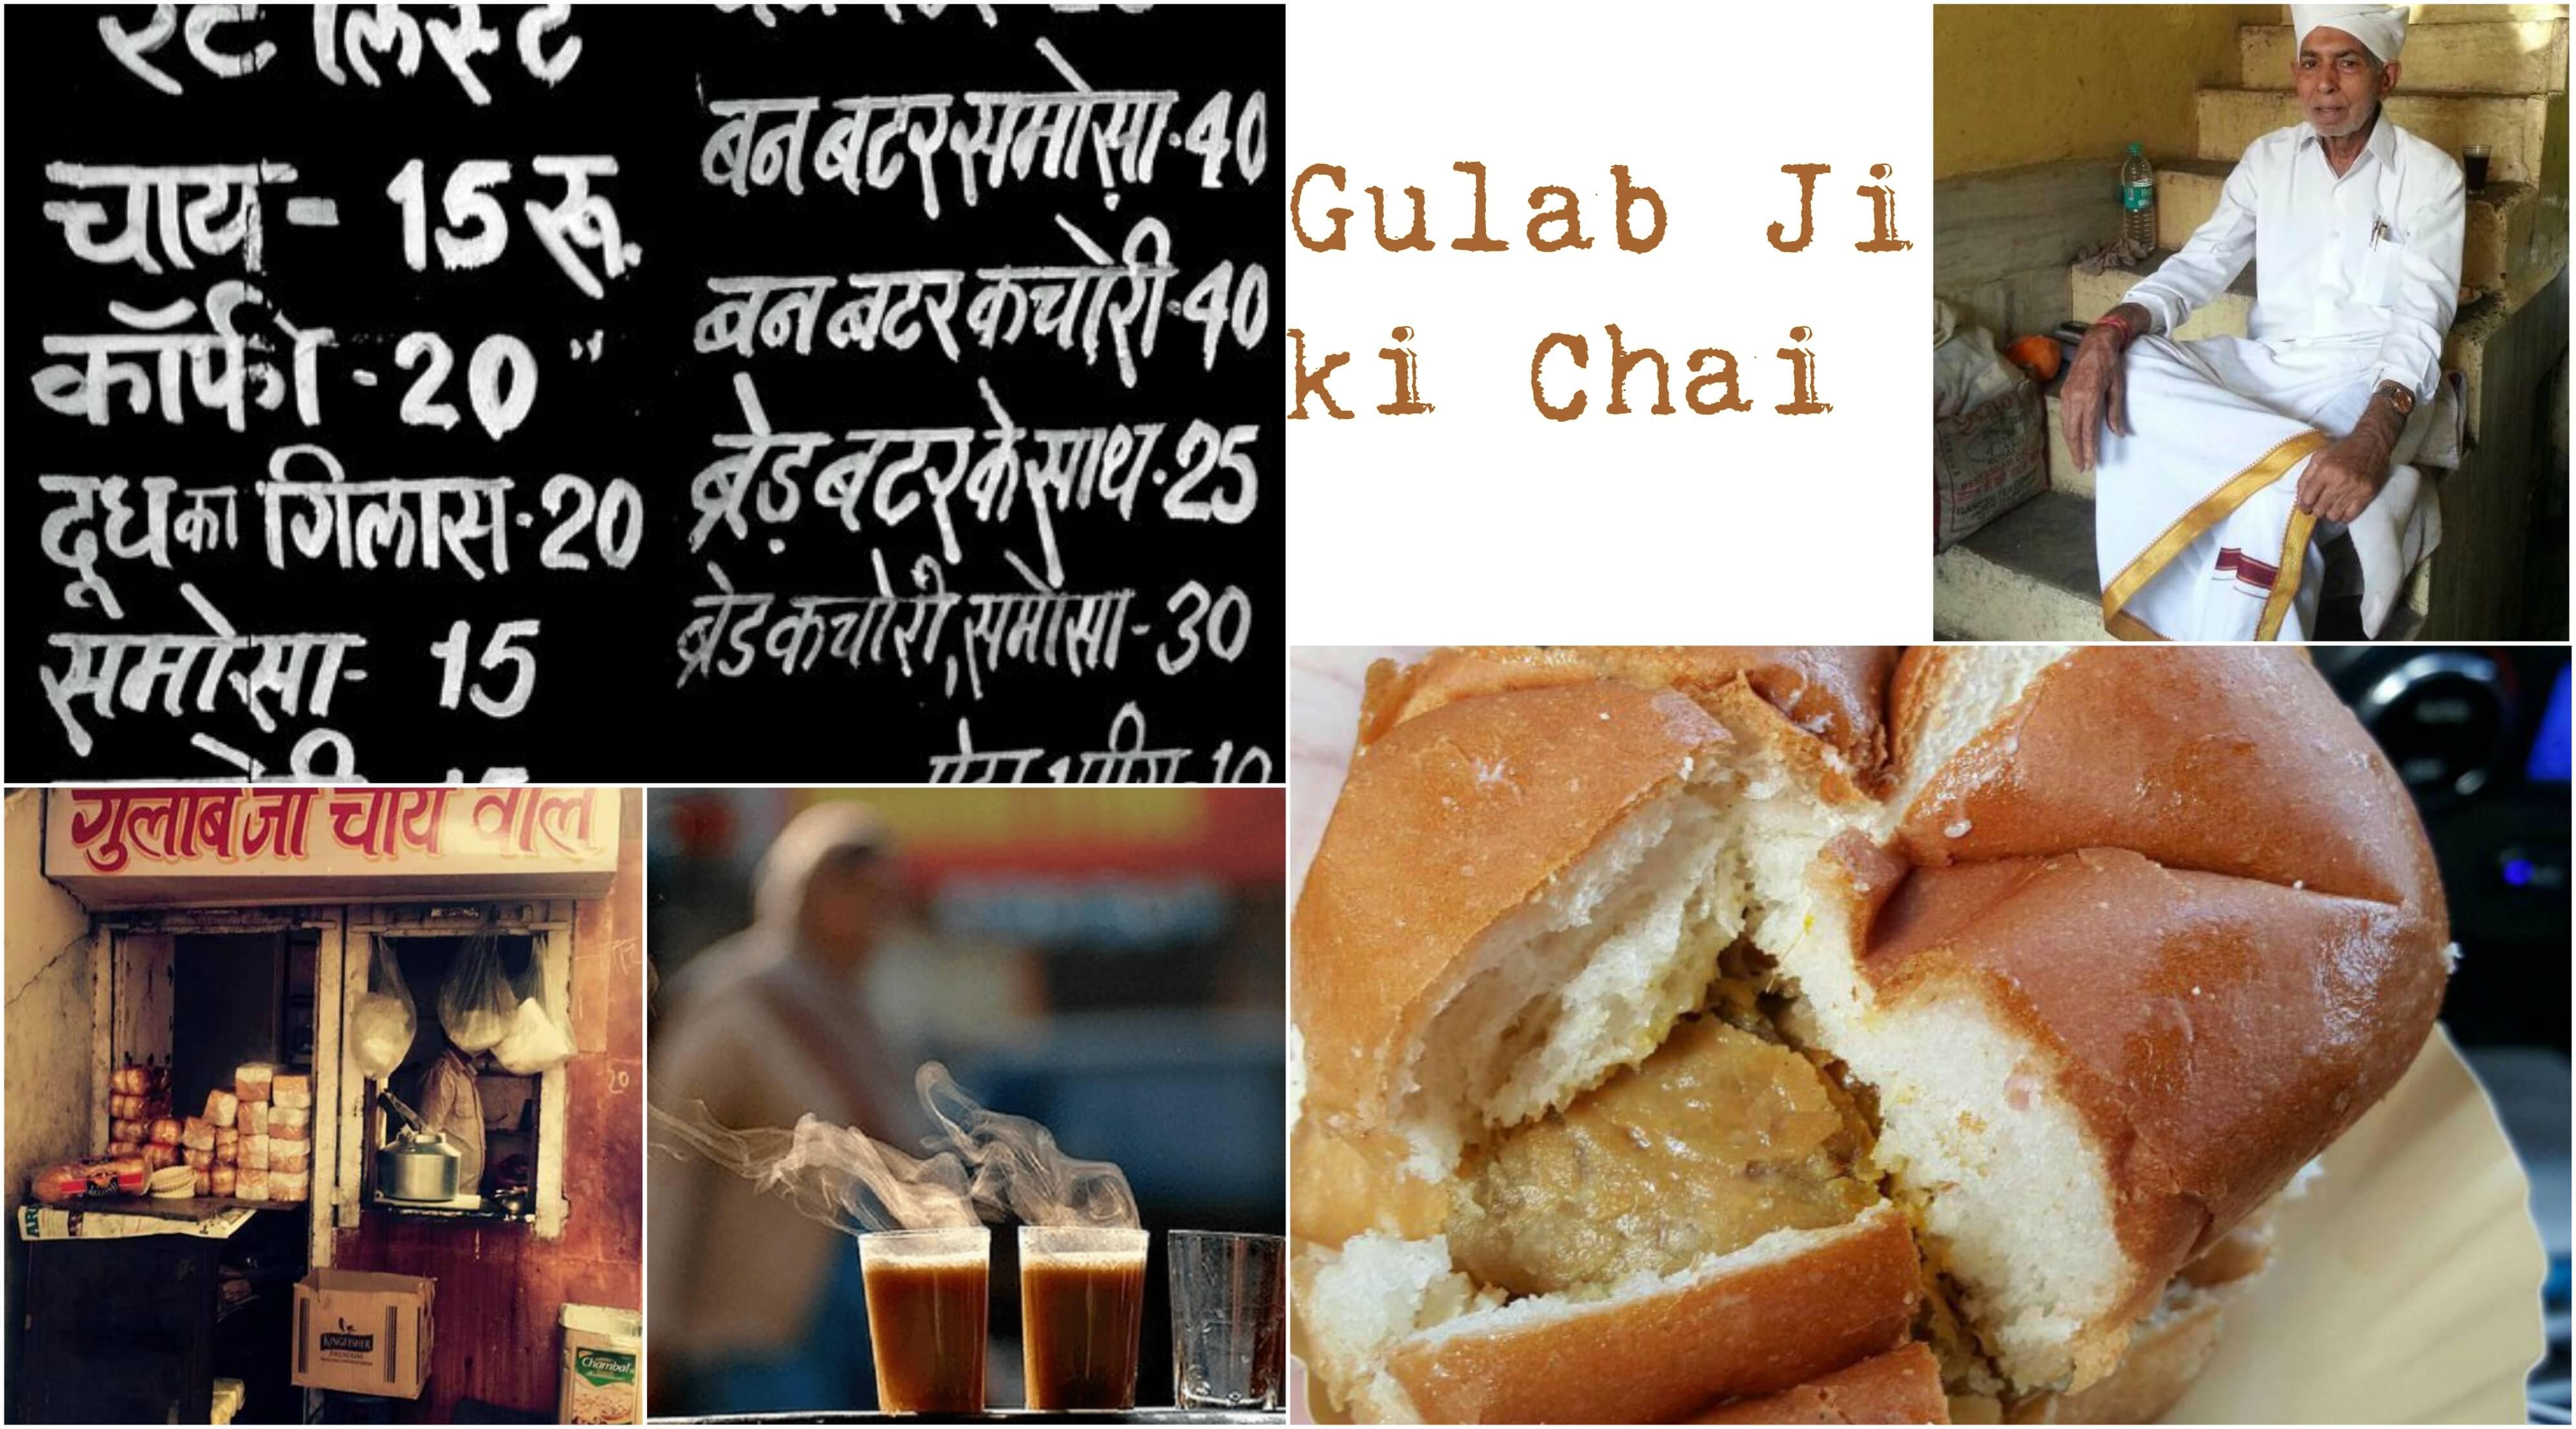 Gulab Ji ki Chai